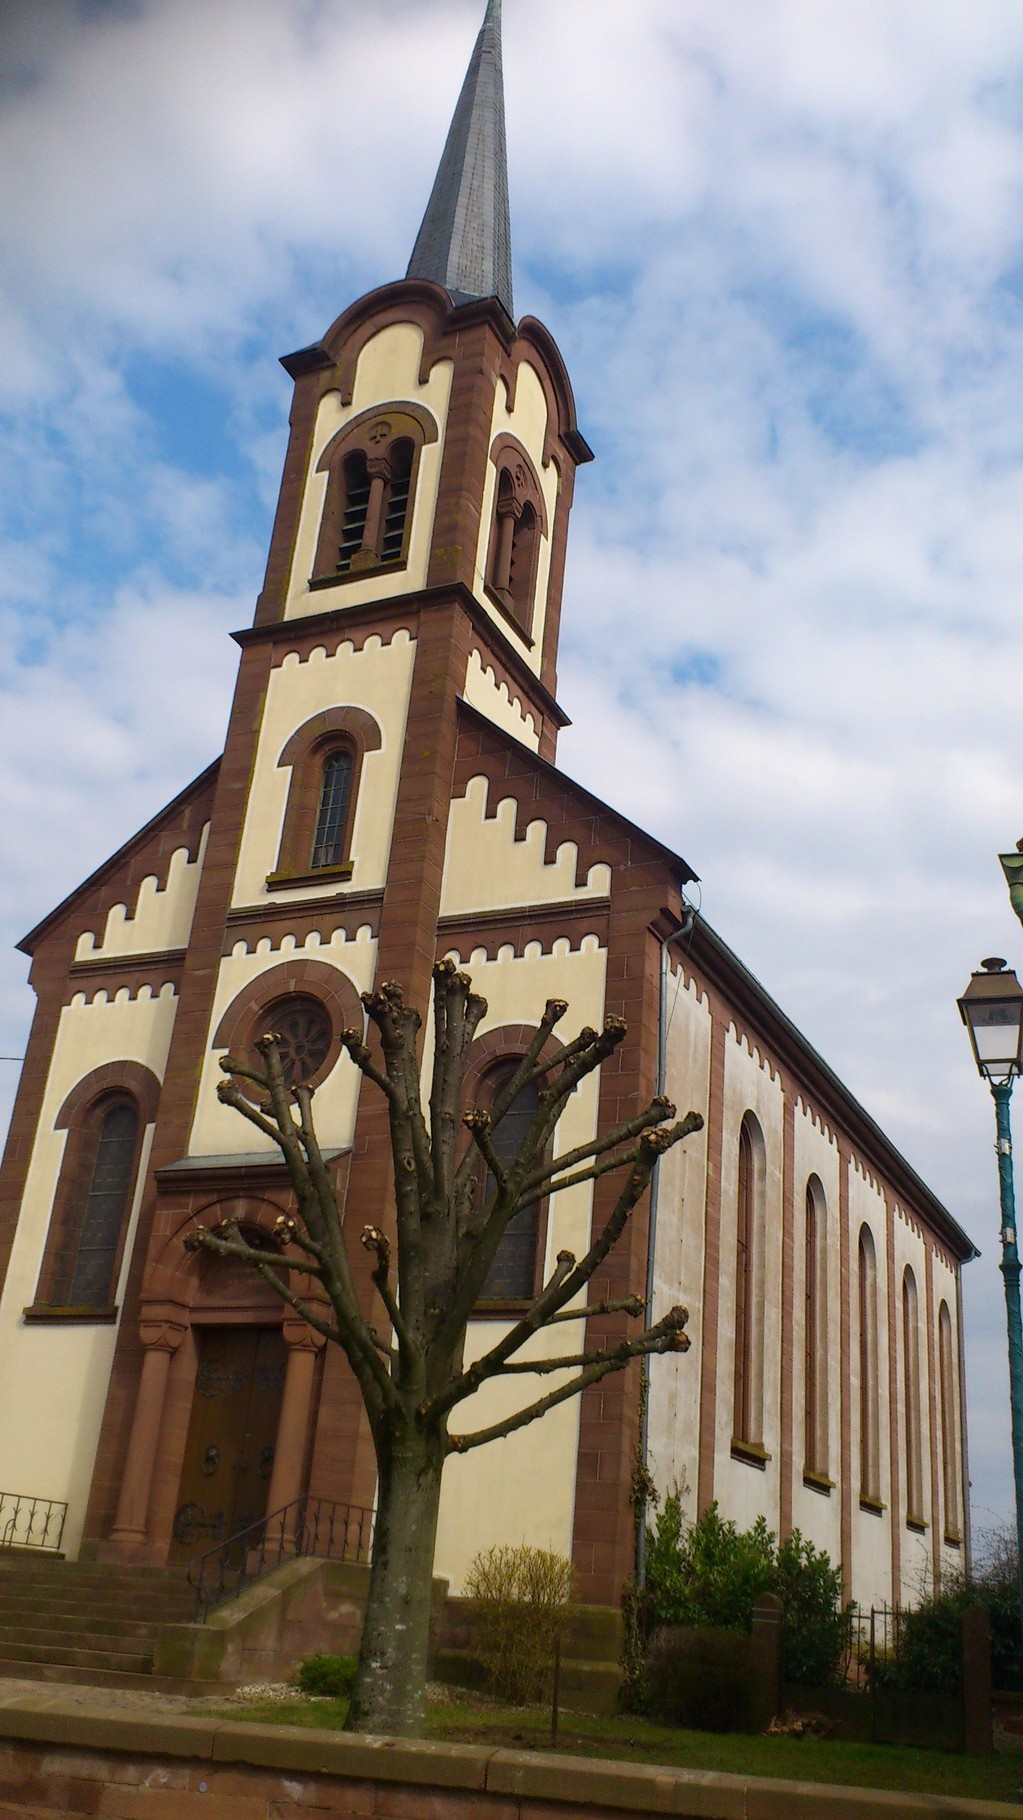 Eglise St Michel de Frœschwiller